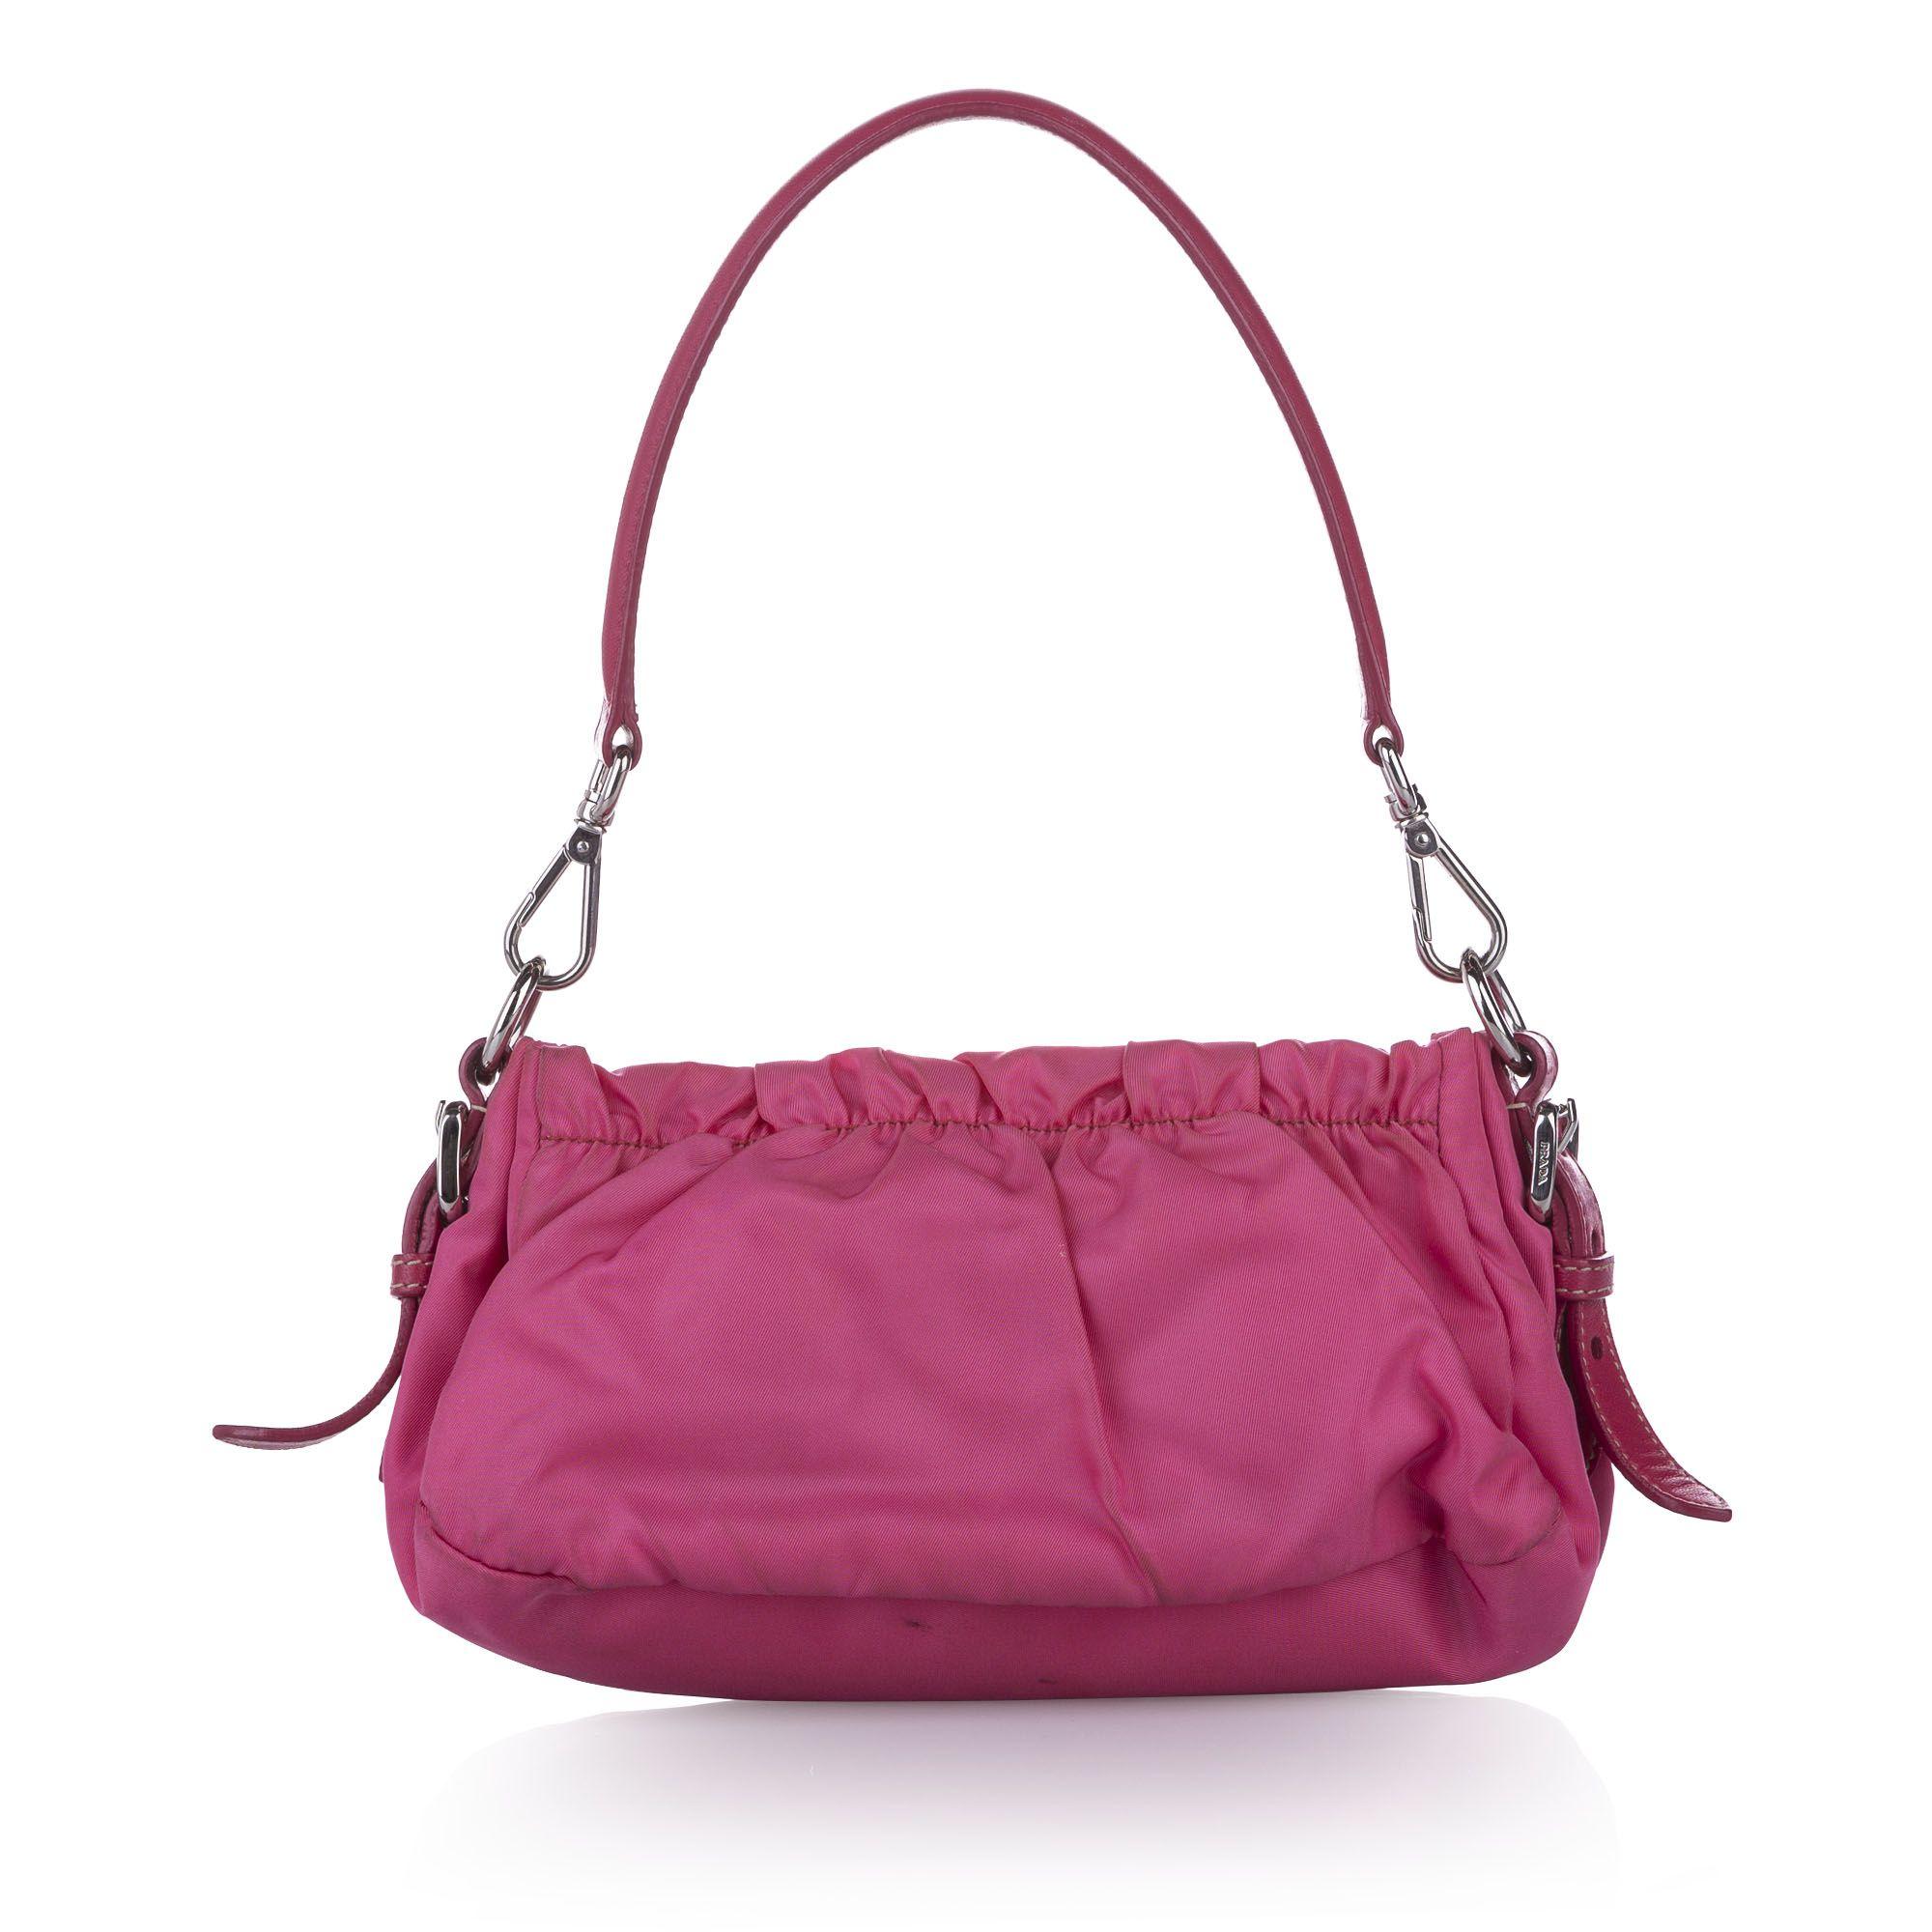 Vintage Prada Tessuto Baguette Pink